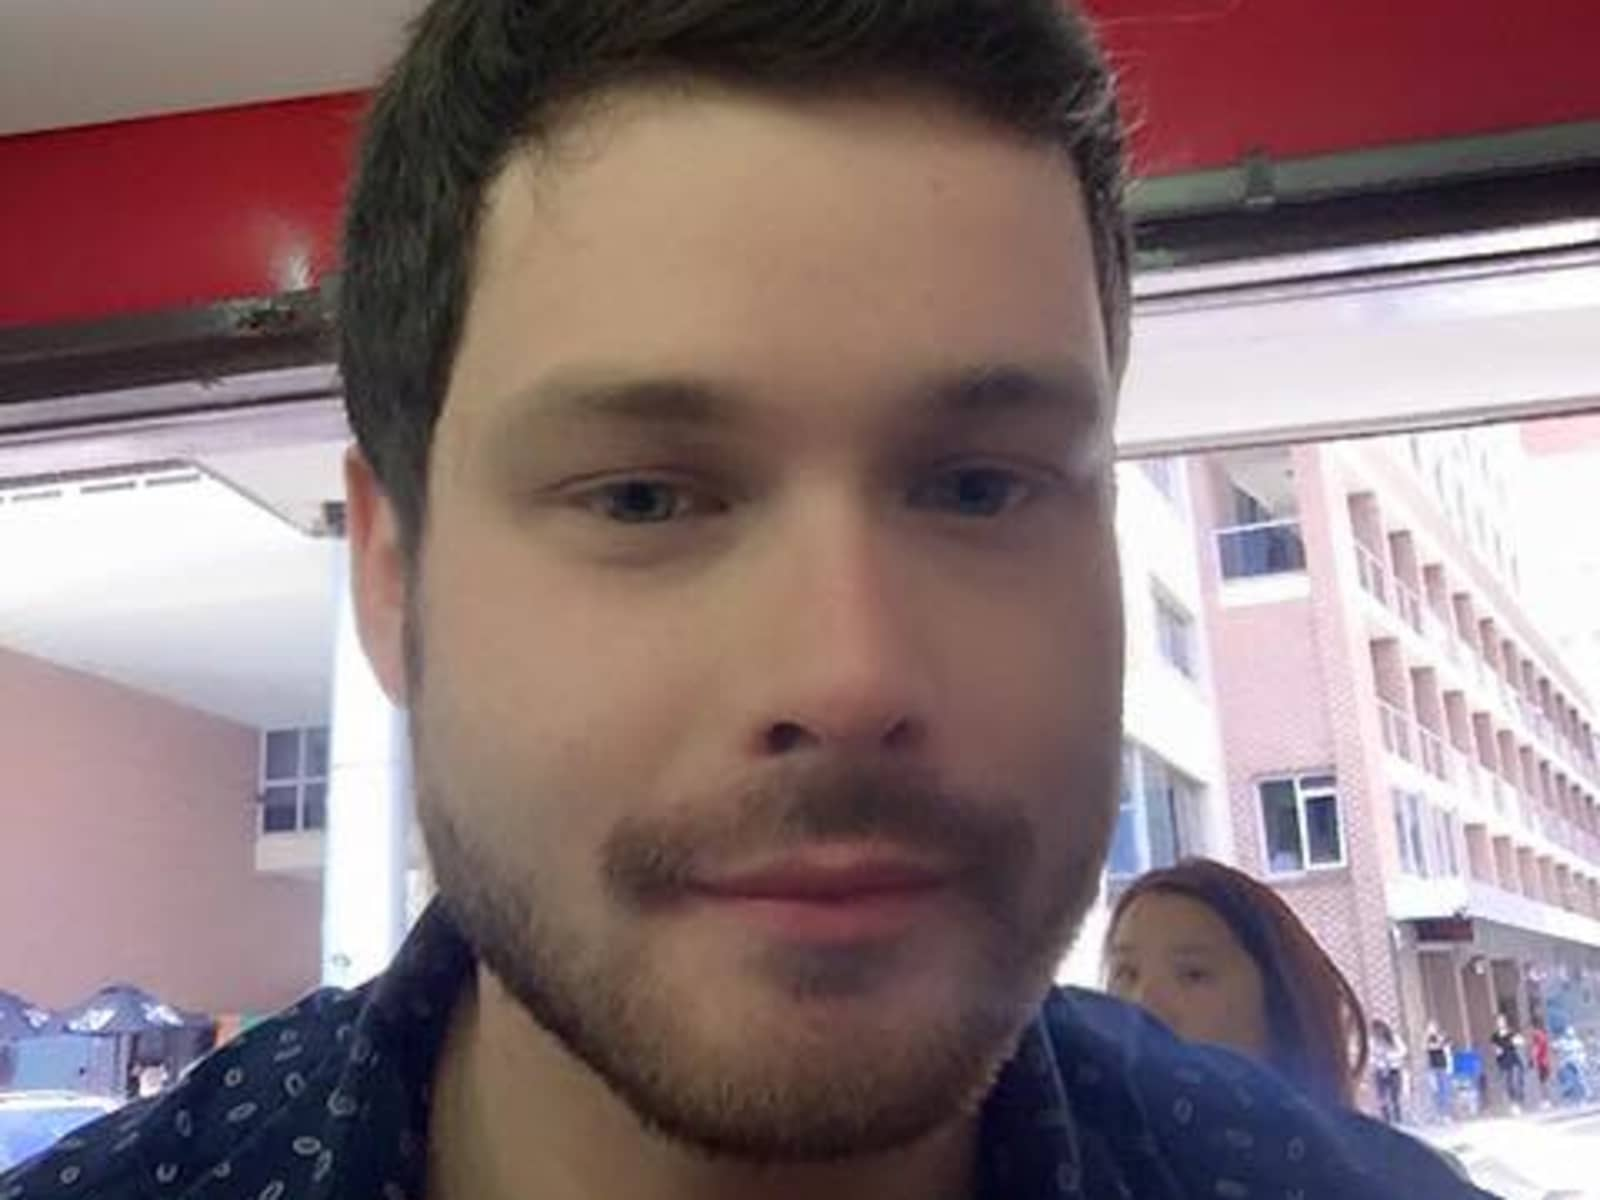 Thomas from London, United Kingdom